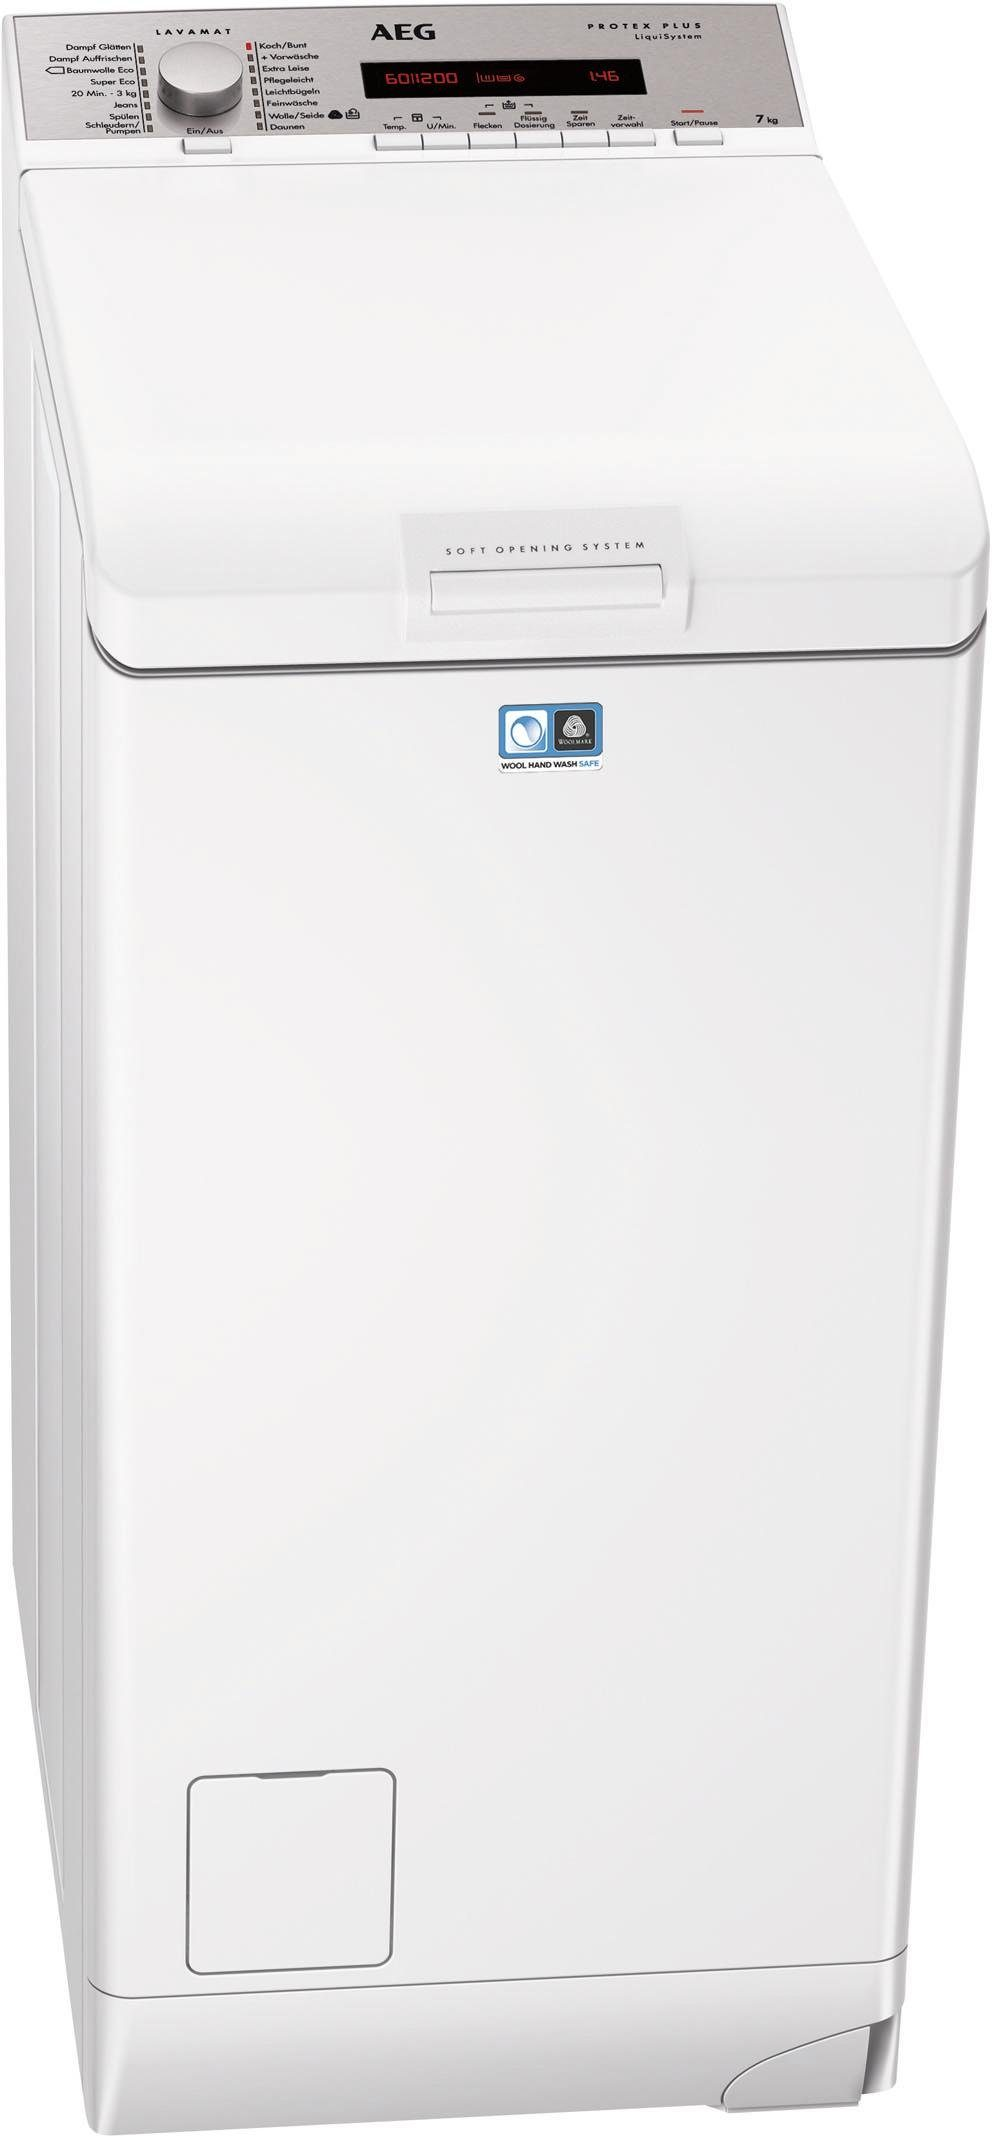 AEG Waschmaschine Toplader L7827TL, A+++, 7 kg, 1200 U/Min